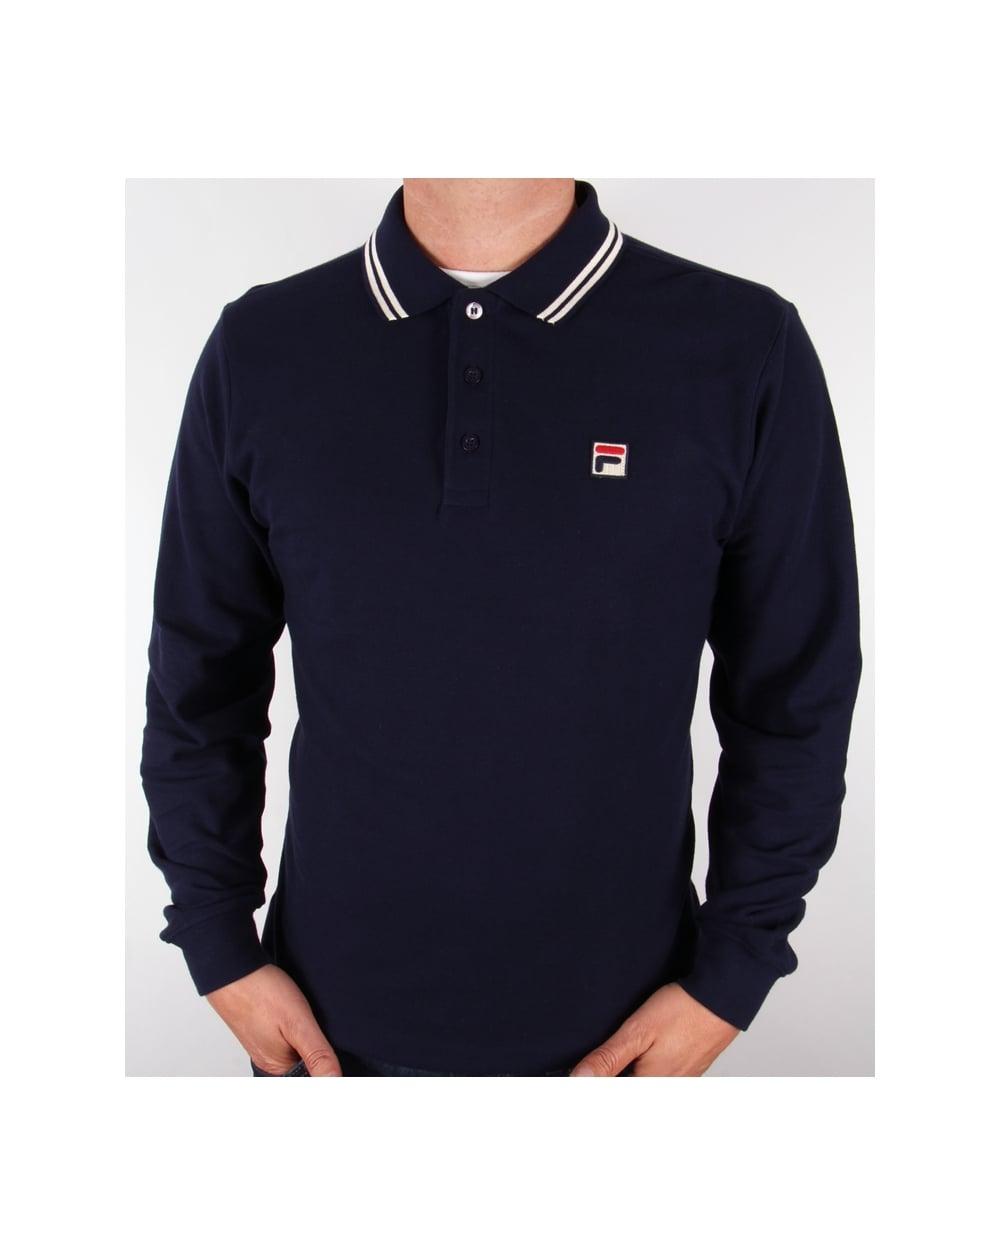 Fila Vintage Ace Long Sleeve Polo Shirt Navy